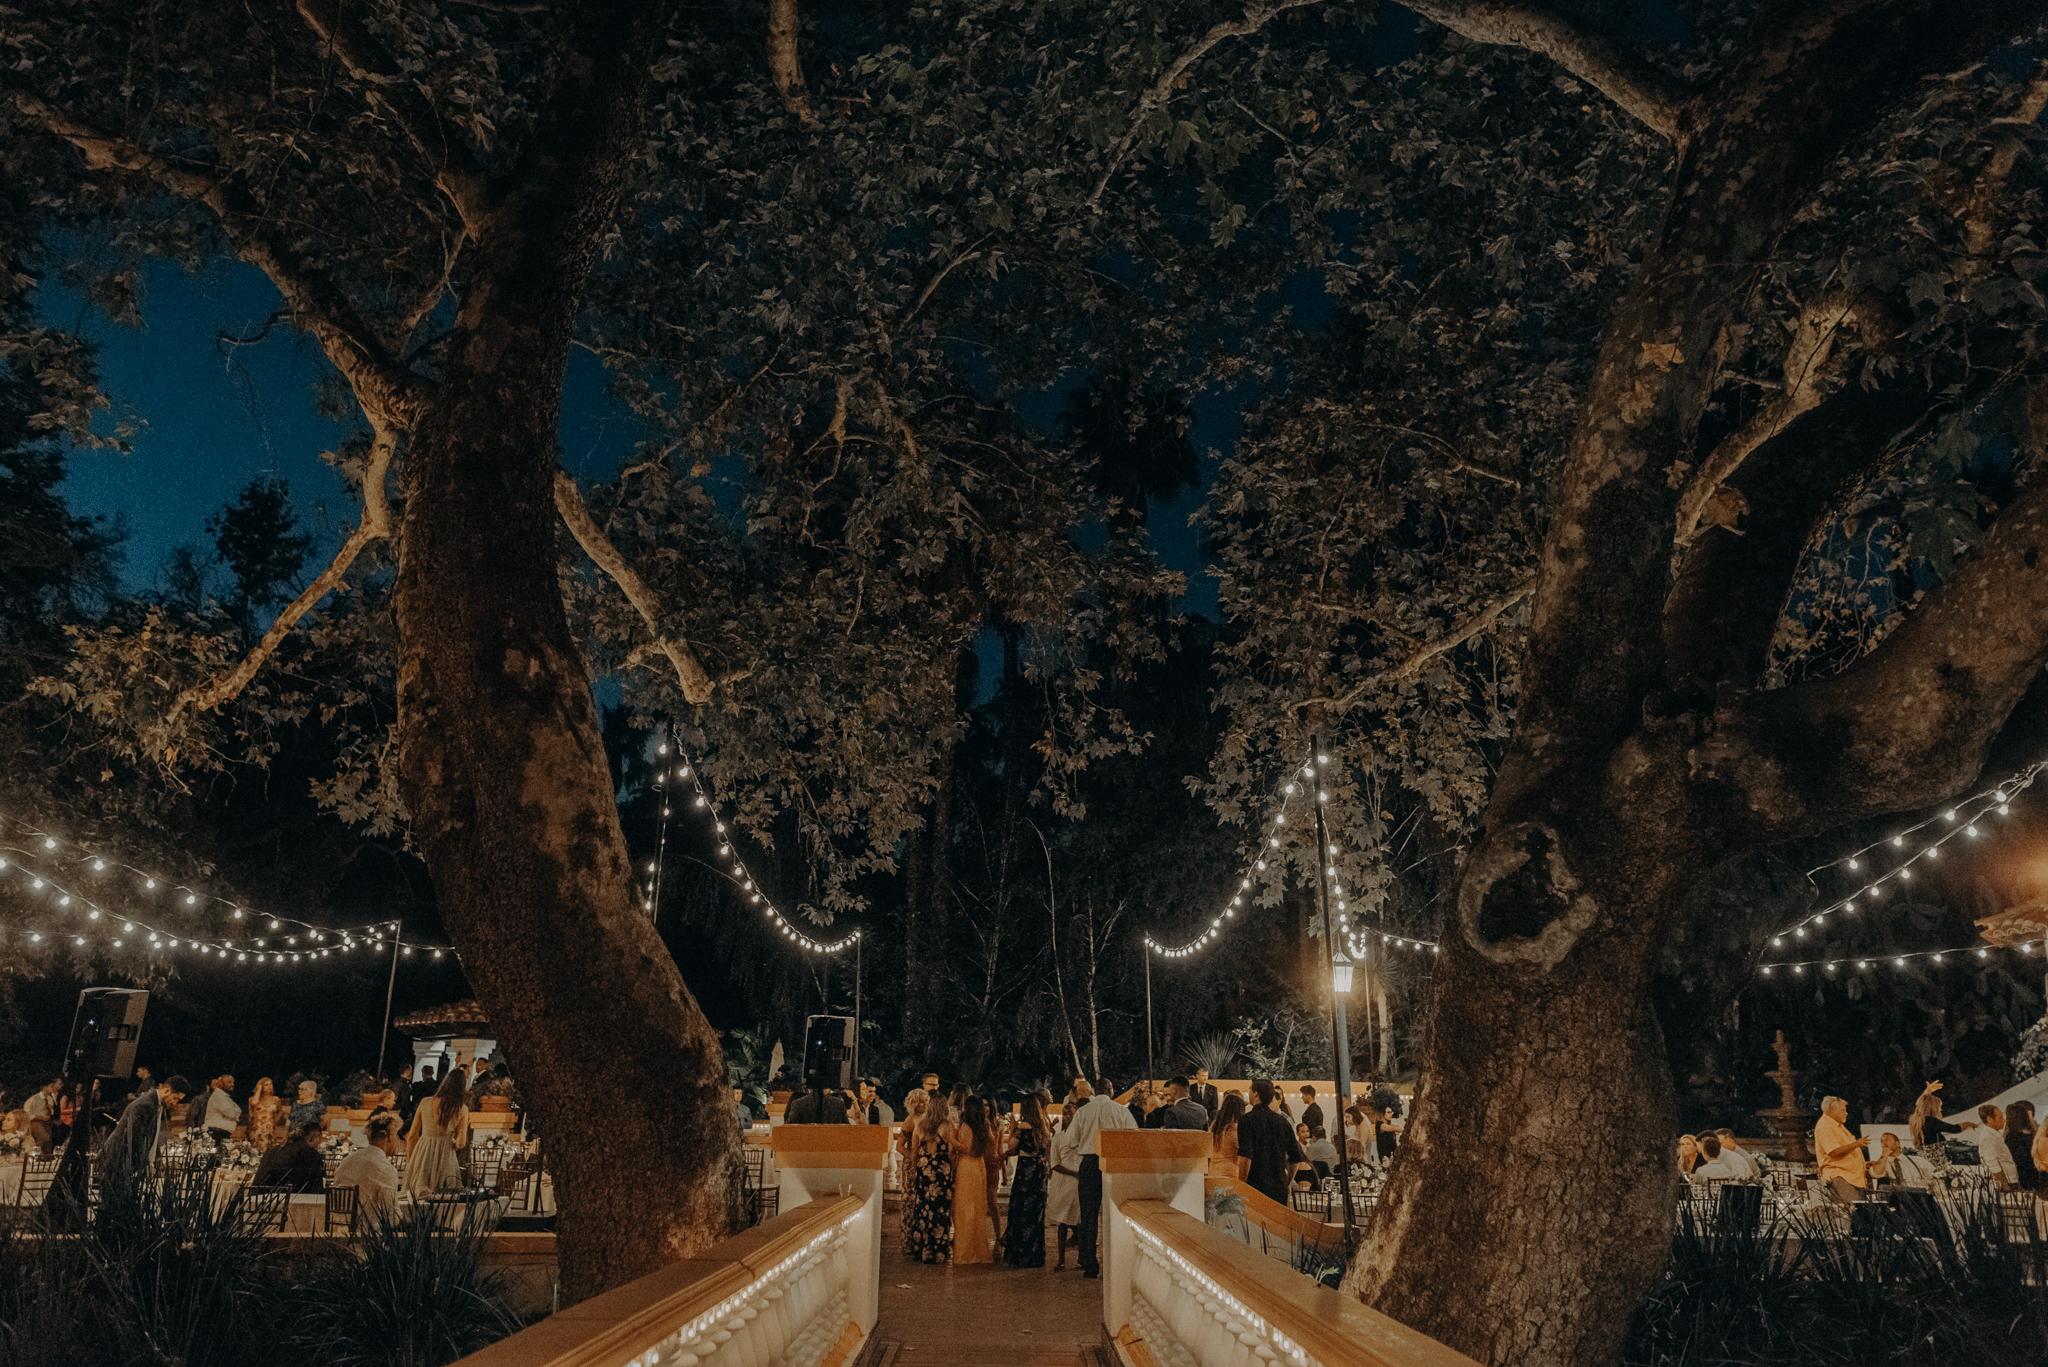 Isaiah + Taylor Photography - Rancho Las Lomas Wedding, Los Angeles Wedding Photographer-161.jpg